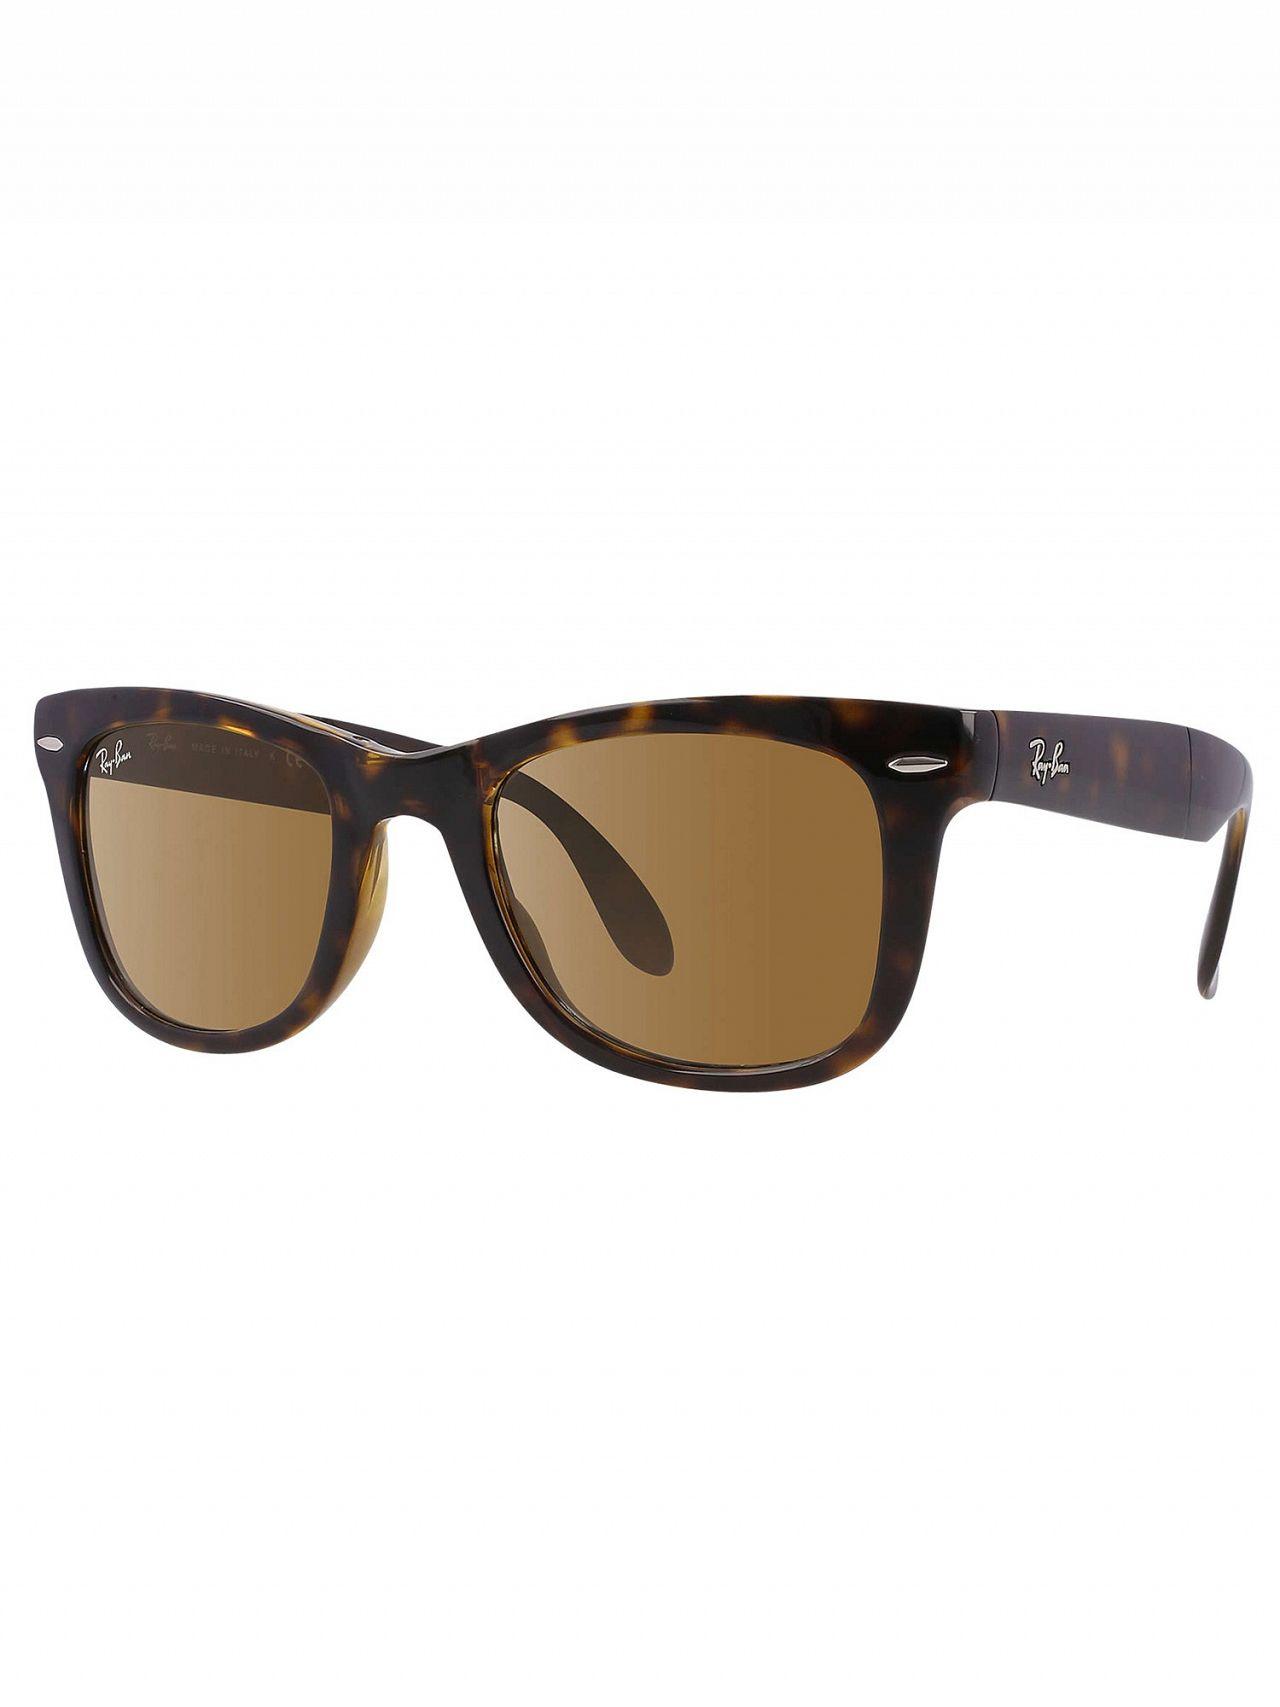 211a0bcb8117 Ray-Ban Tortoise RB4105 Polarized Wayfarer Folding Sunglasses